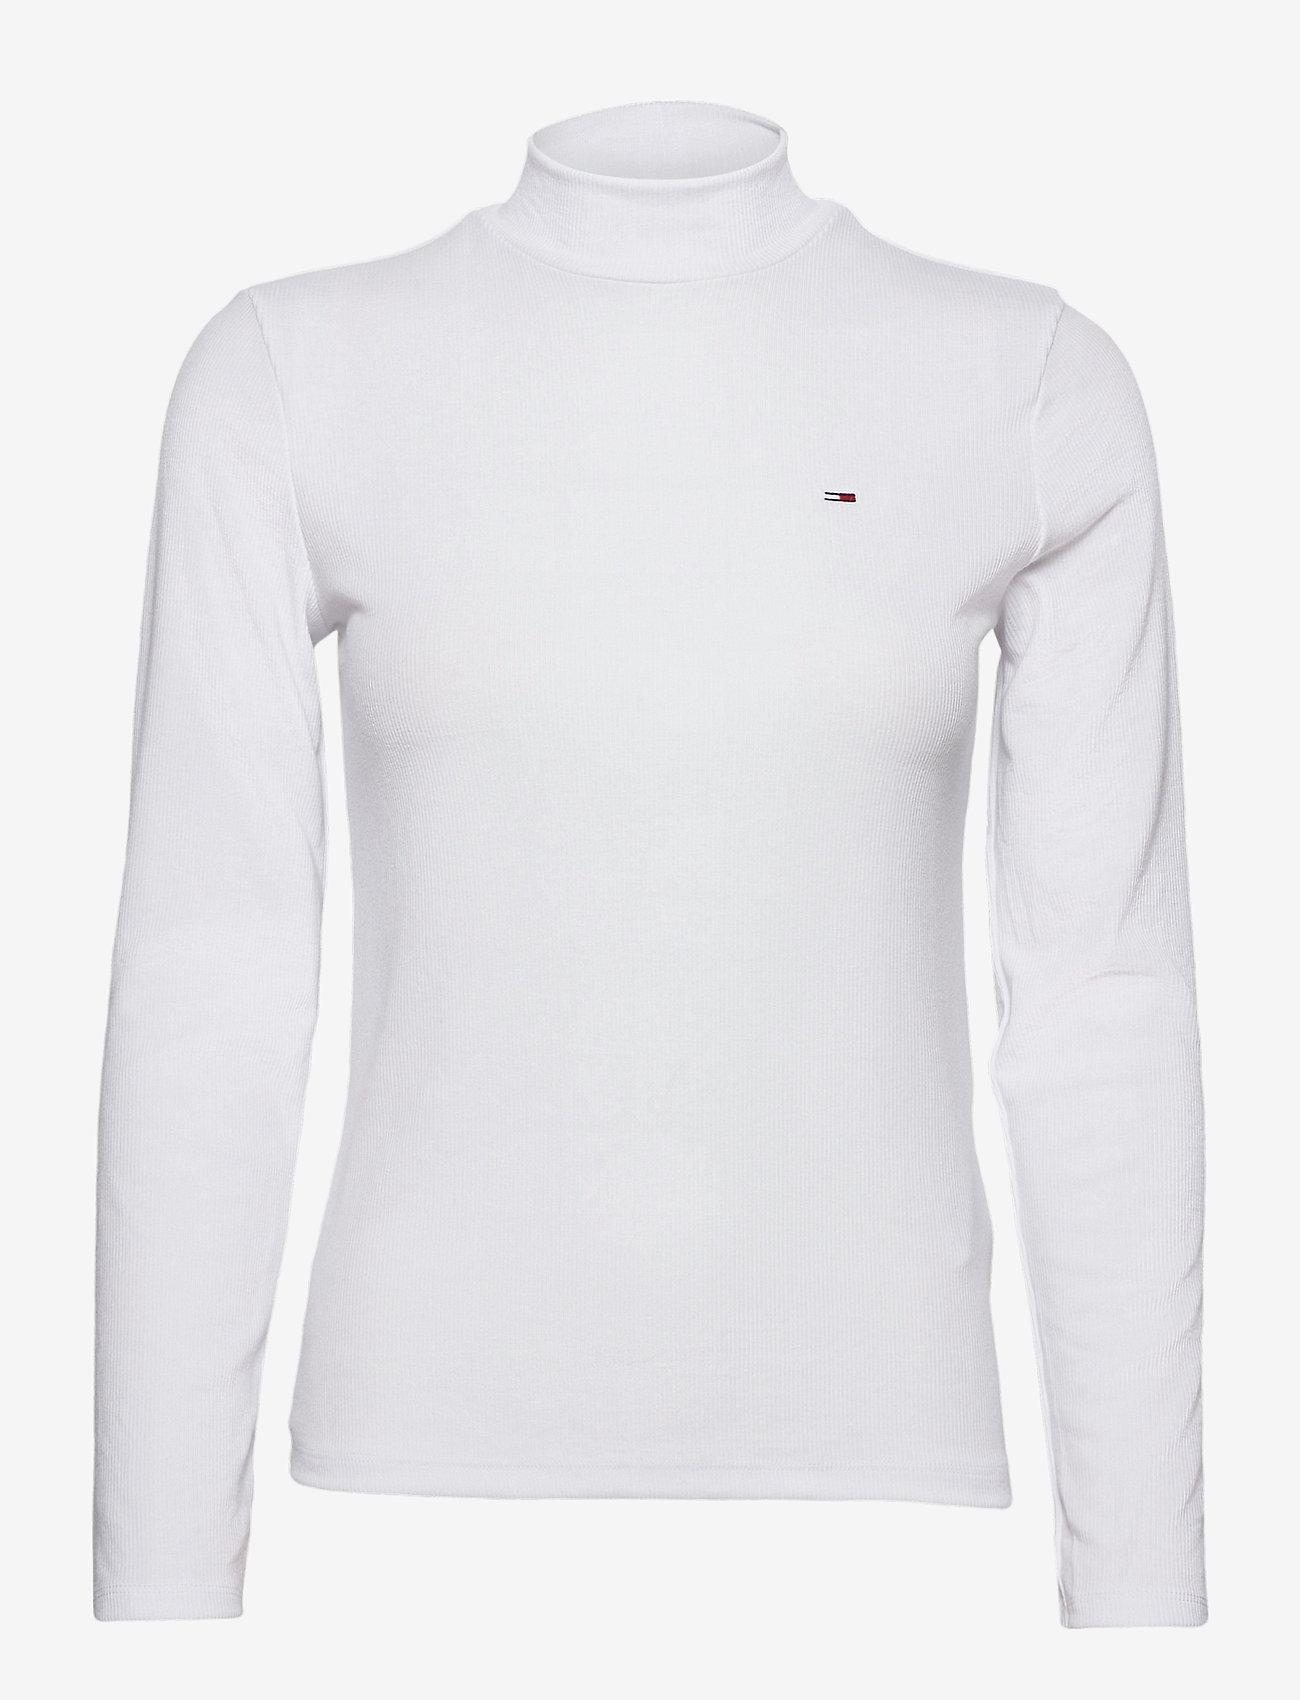 Tommy Jeans - TJW RIB MOCK NECK LONGSLEEVE - long-sleeved tops - white - 0